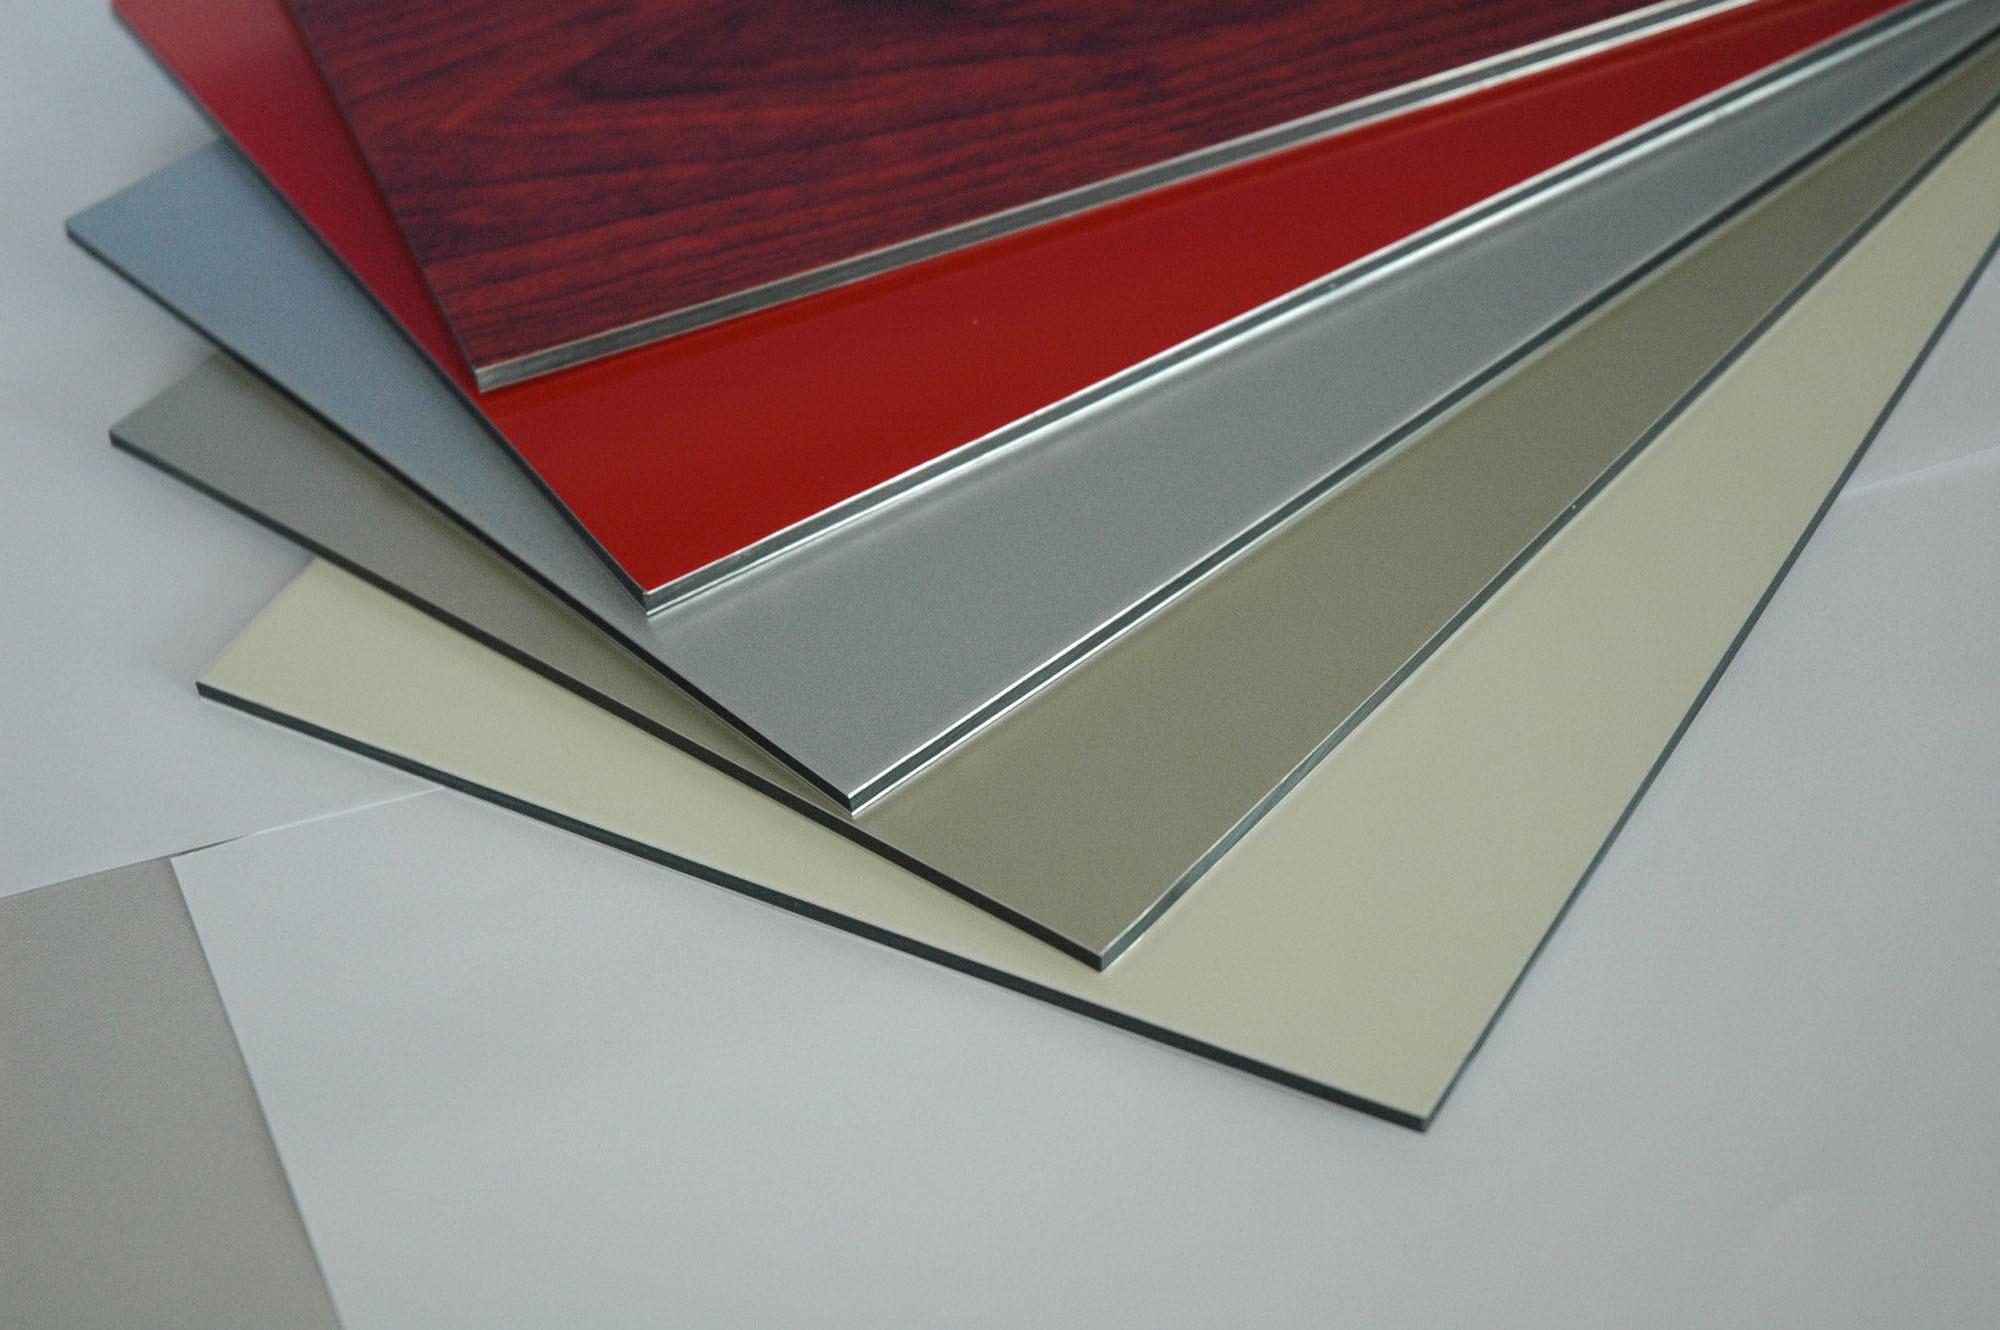 jenis aluminium Panel (made-in-china.com)